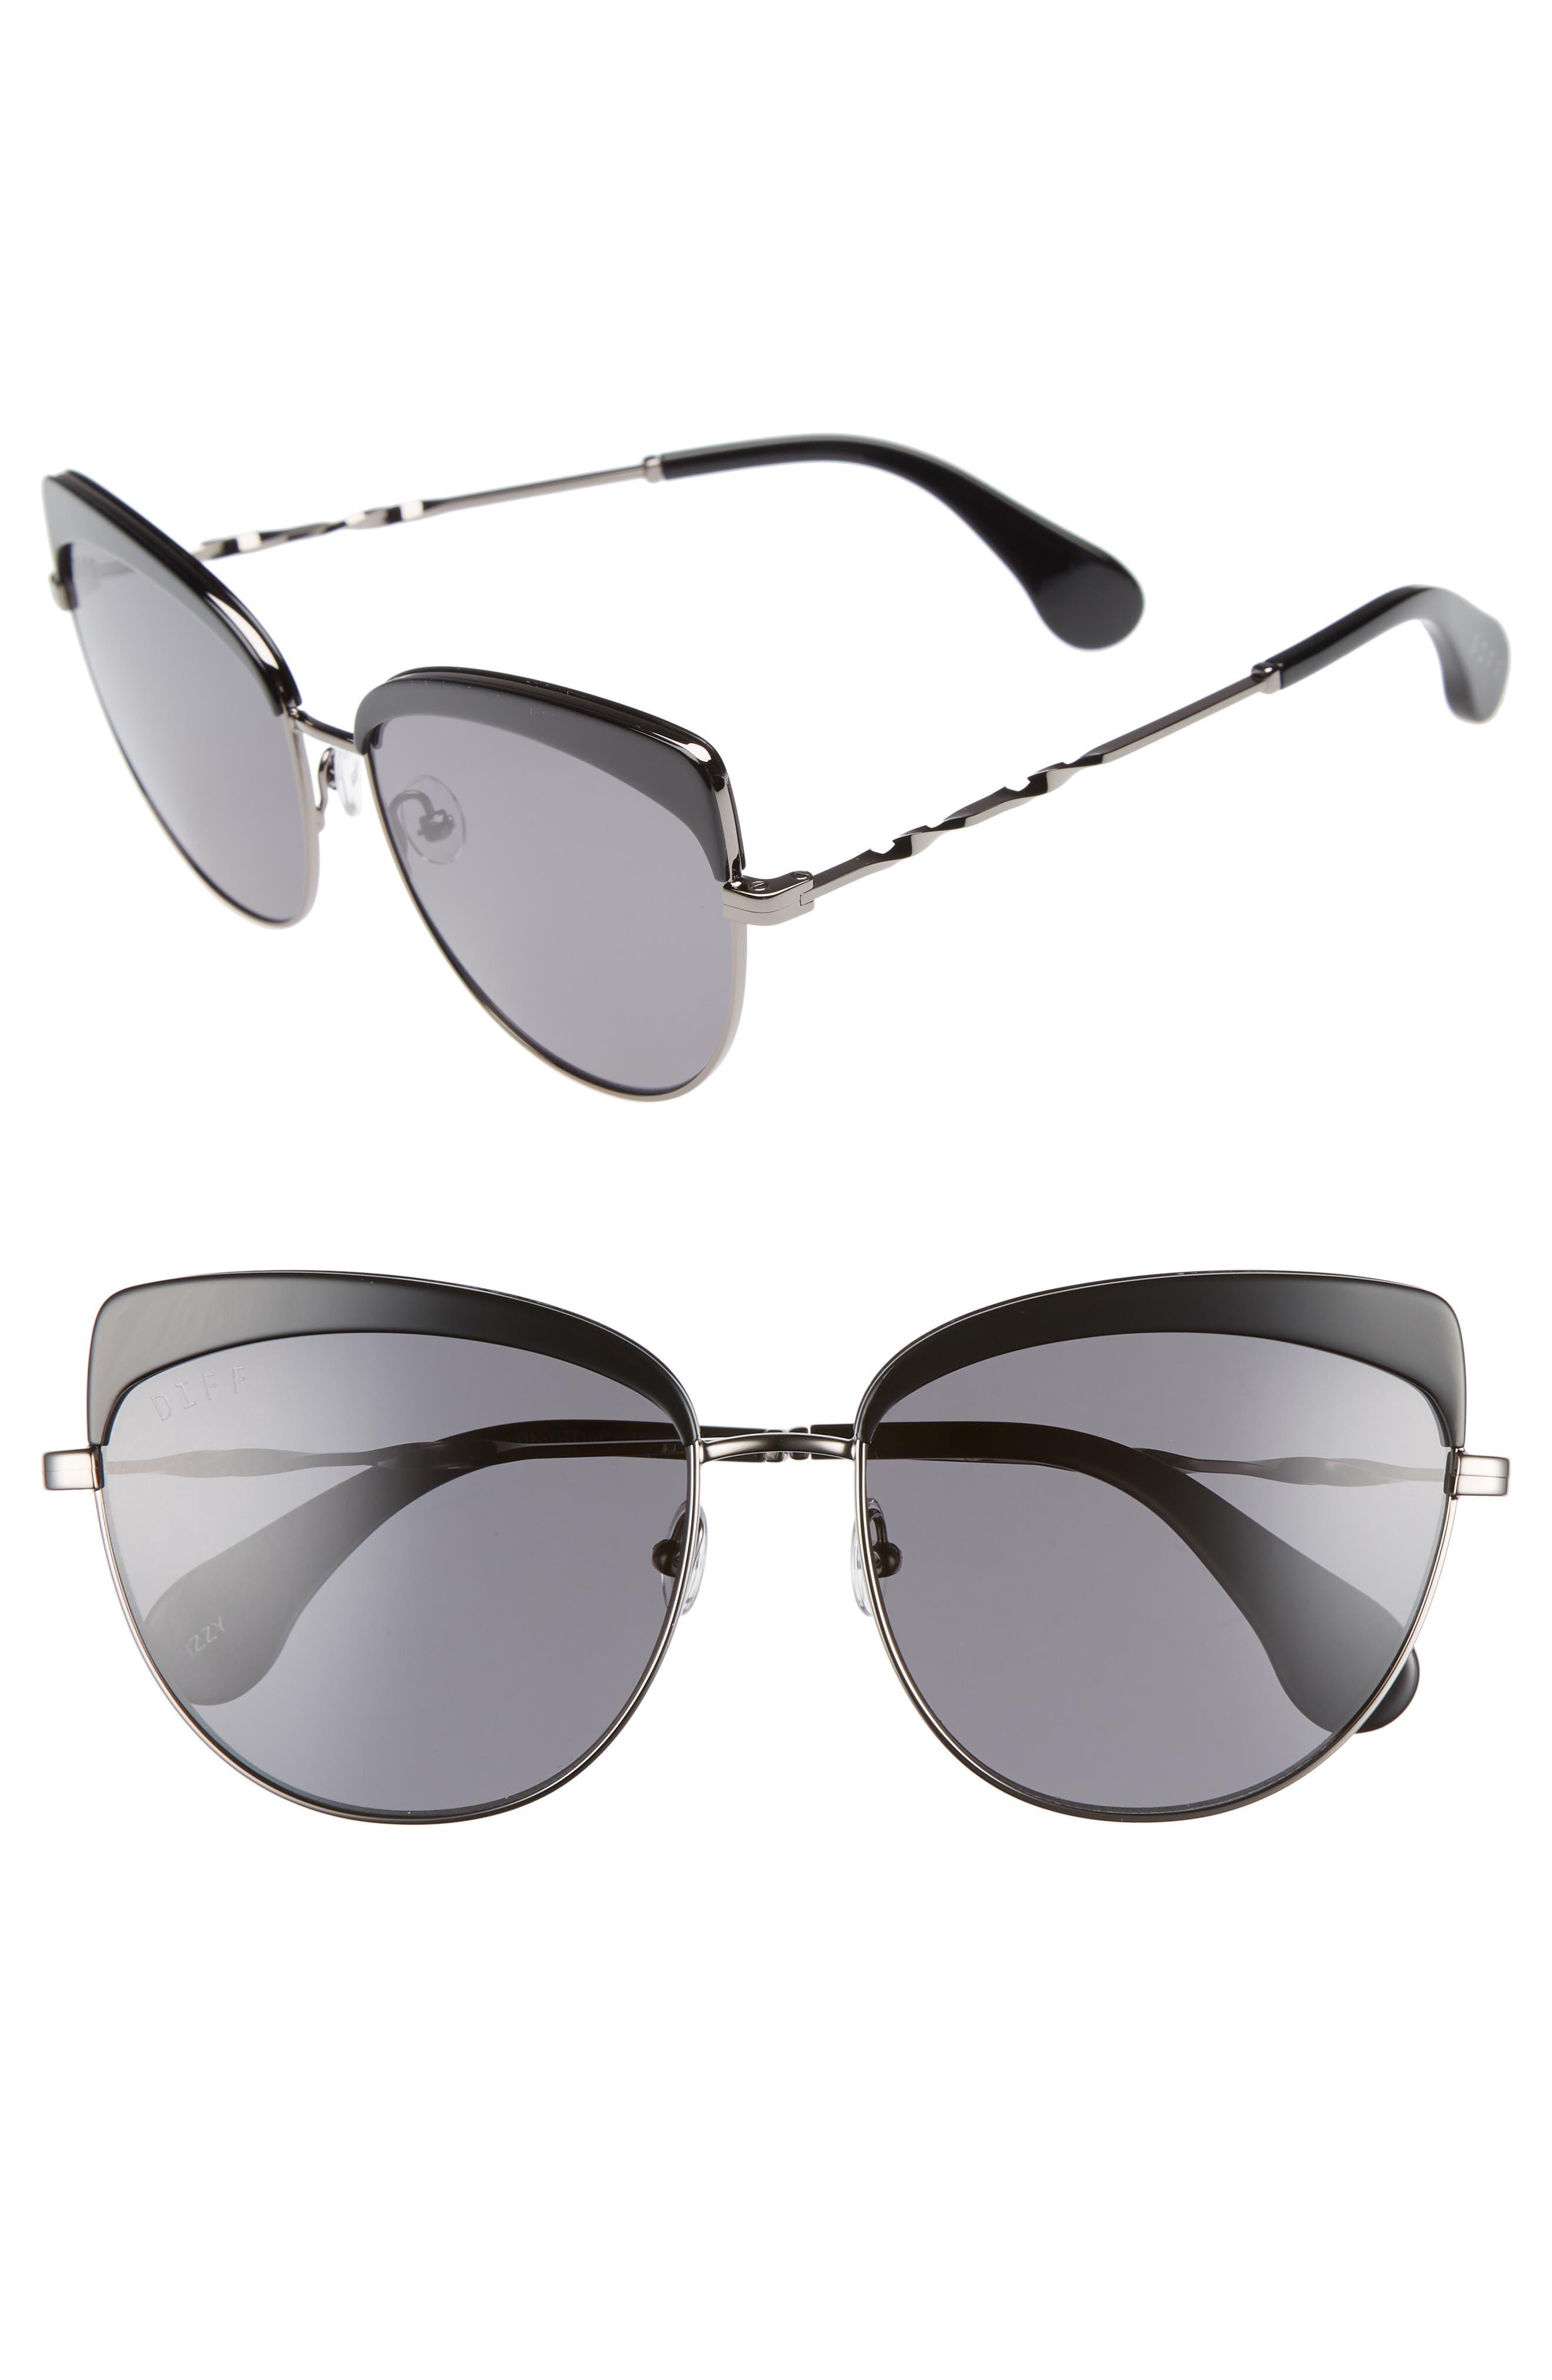 Izzy 59mm Polarized Cat Eye Sunglasses,                             Main thumbnail 1, color,                             Black/ Grey